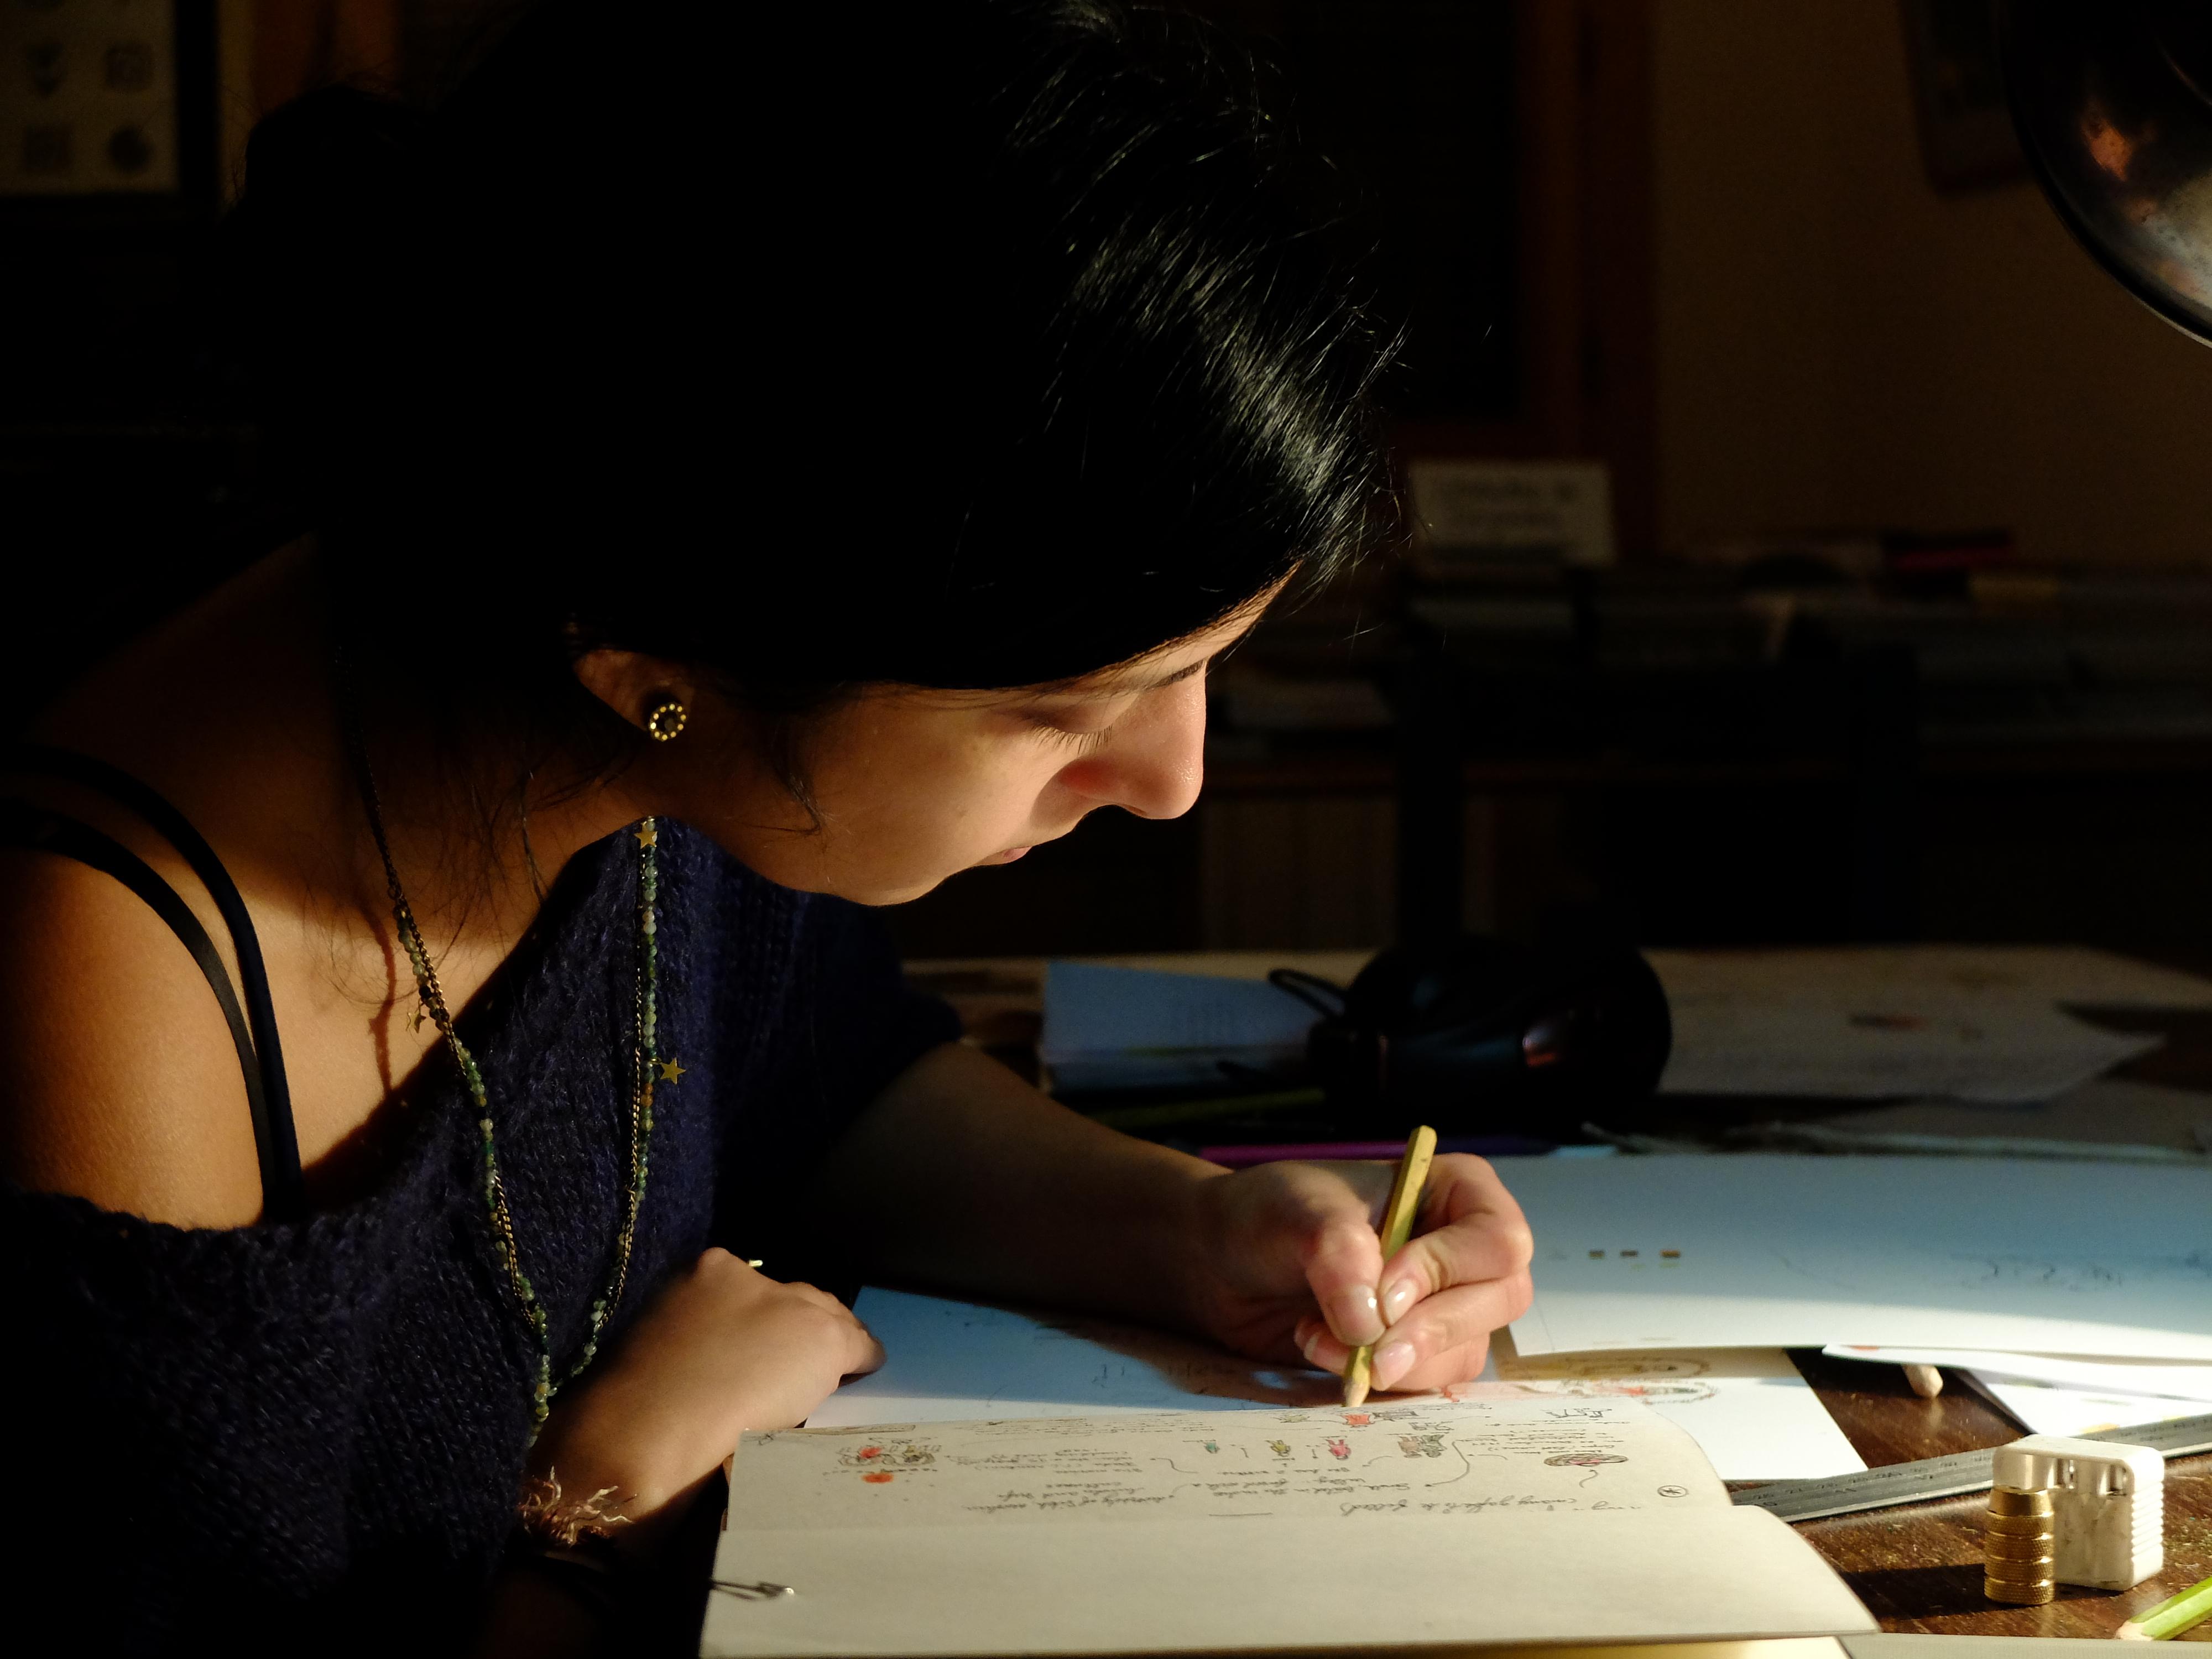 Karishma draws on paper